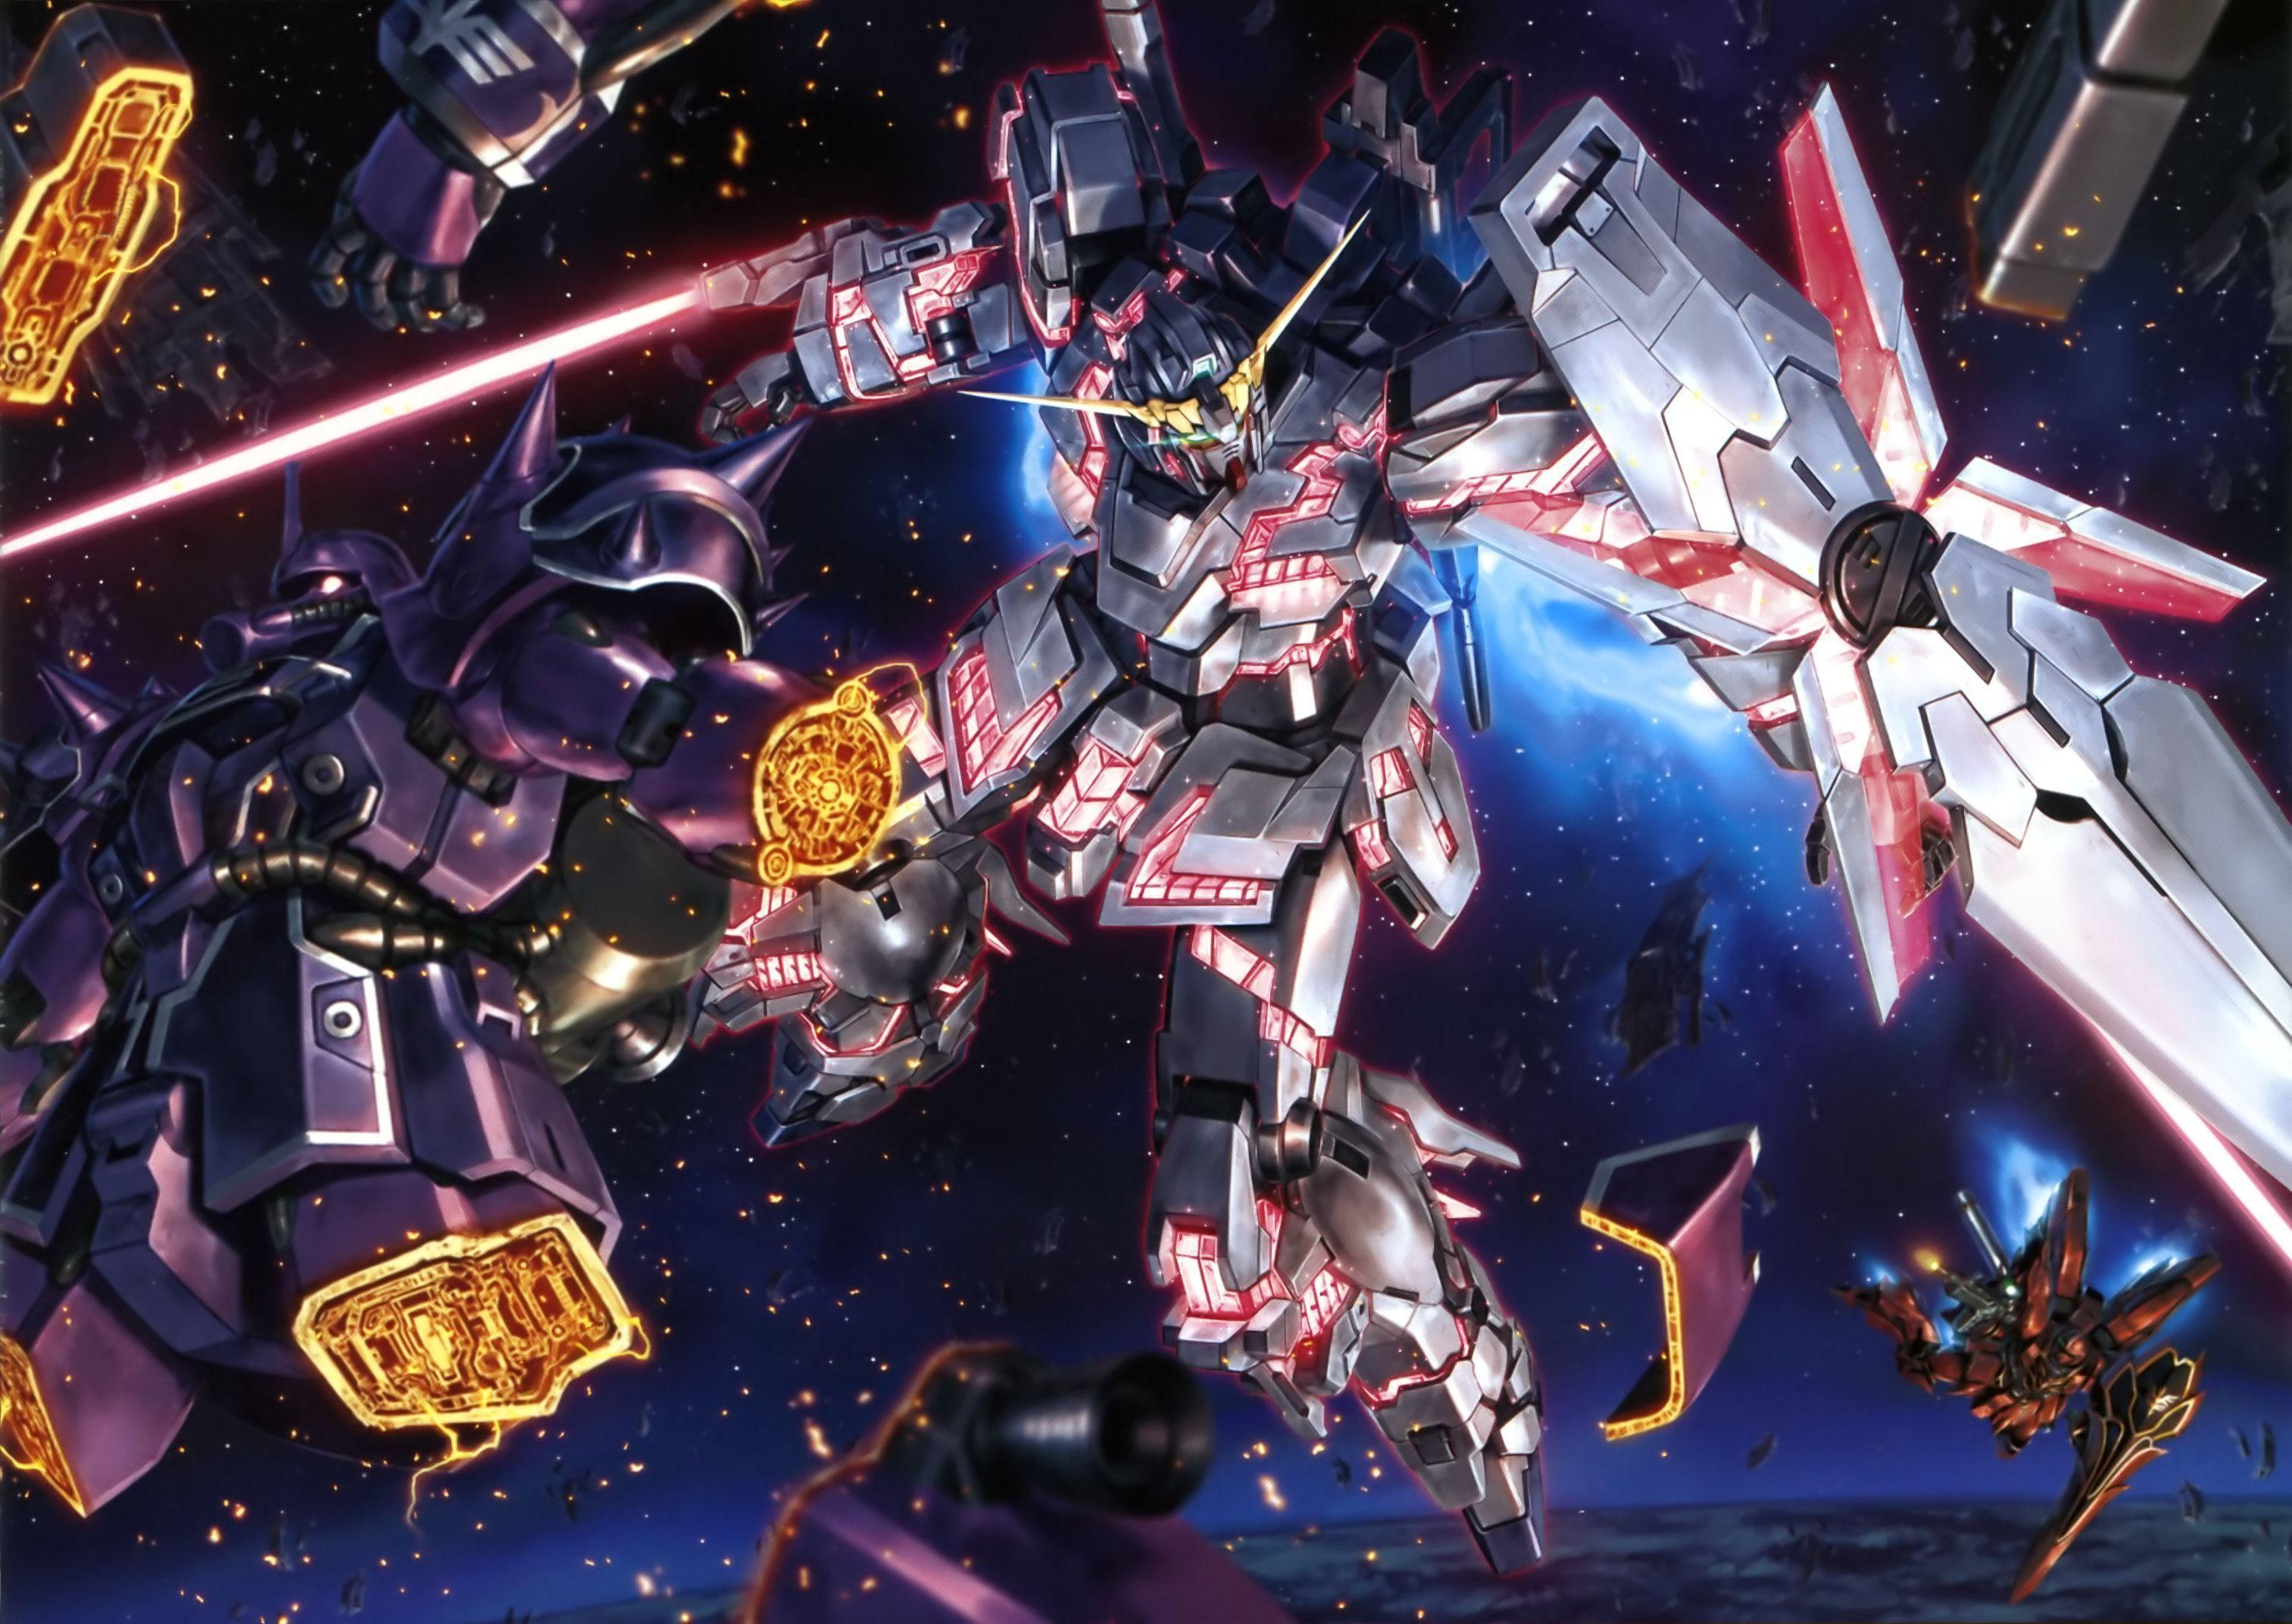 Mobile Suit Gundam Unicorn Wallpapers - Wallpaper Cave